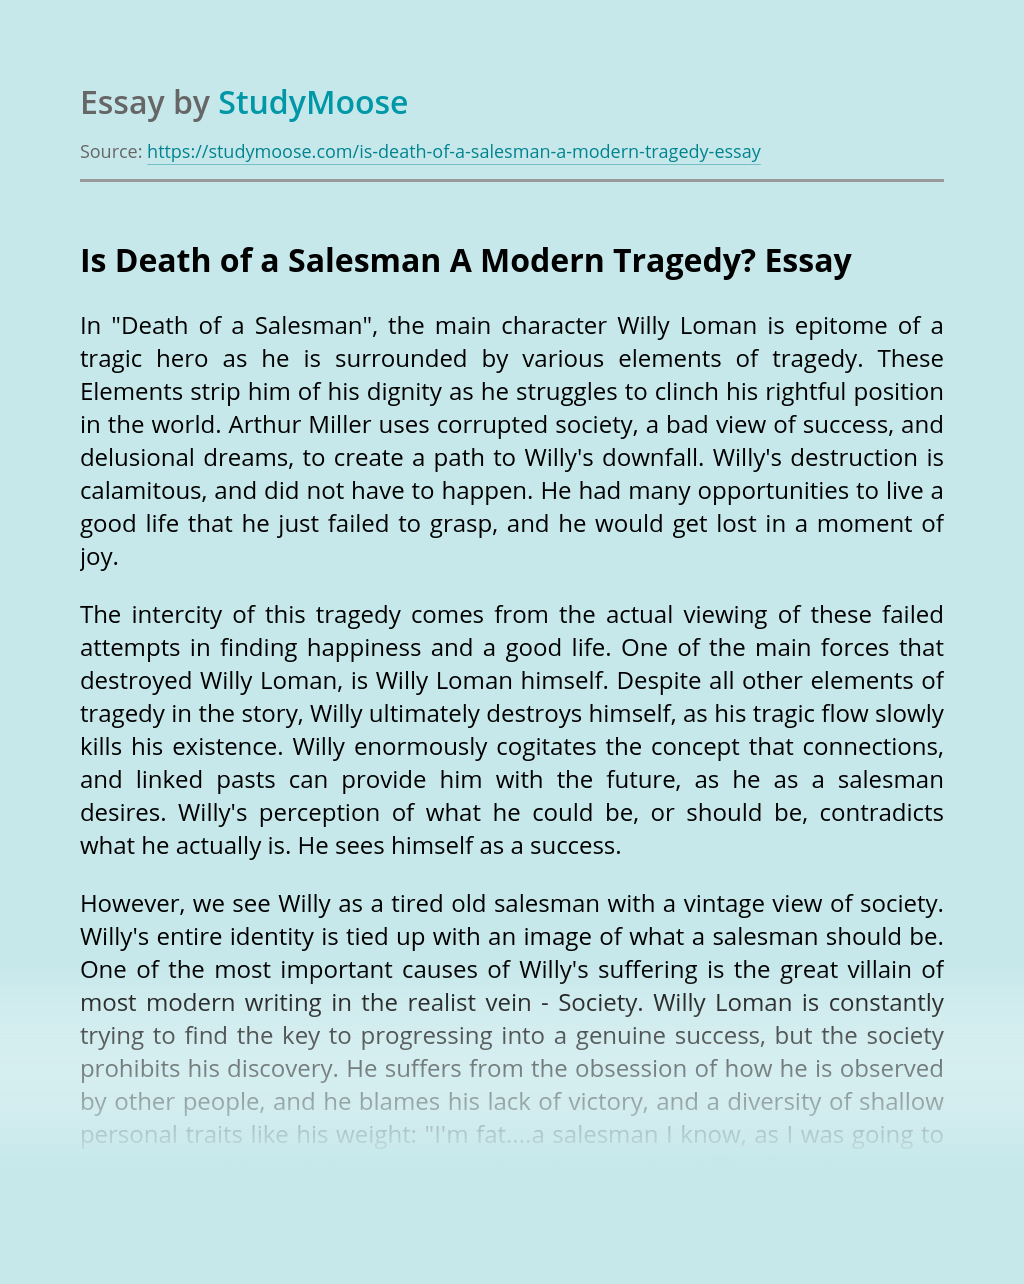 Is Death of a Salesman A Modern Tragedy?